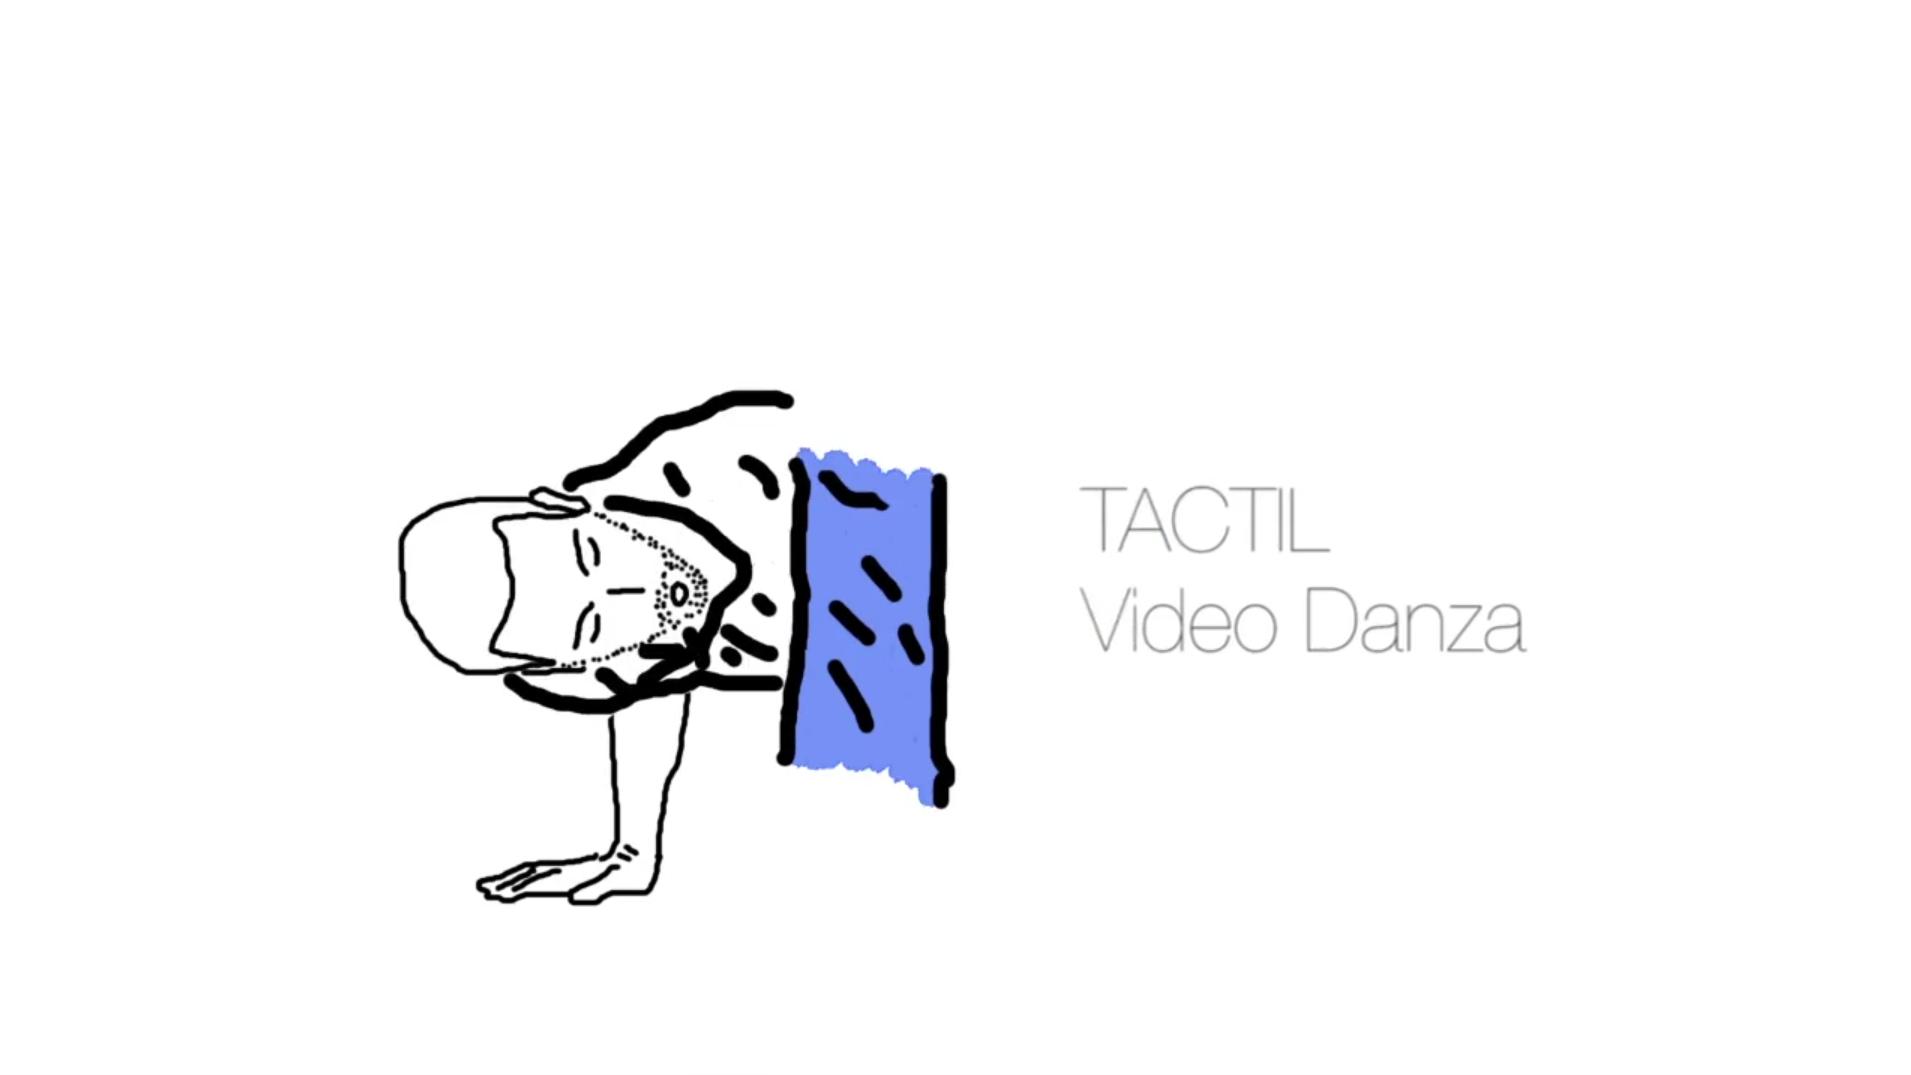 tactil video danza blanali